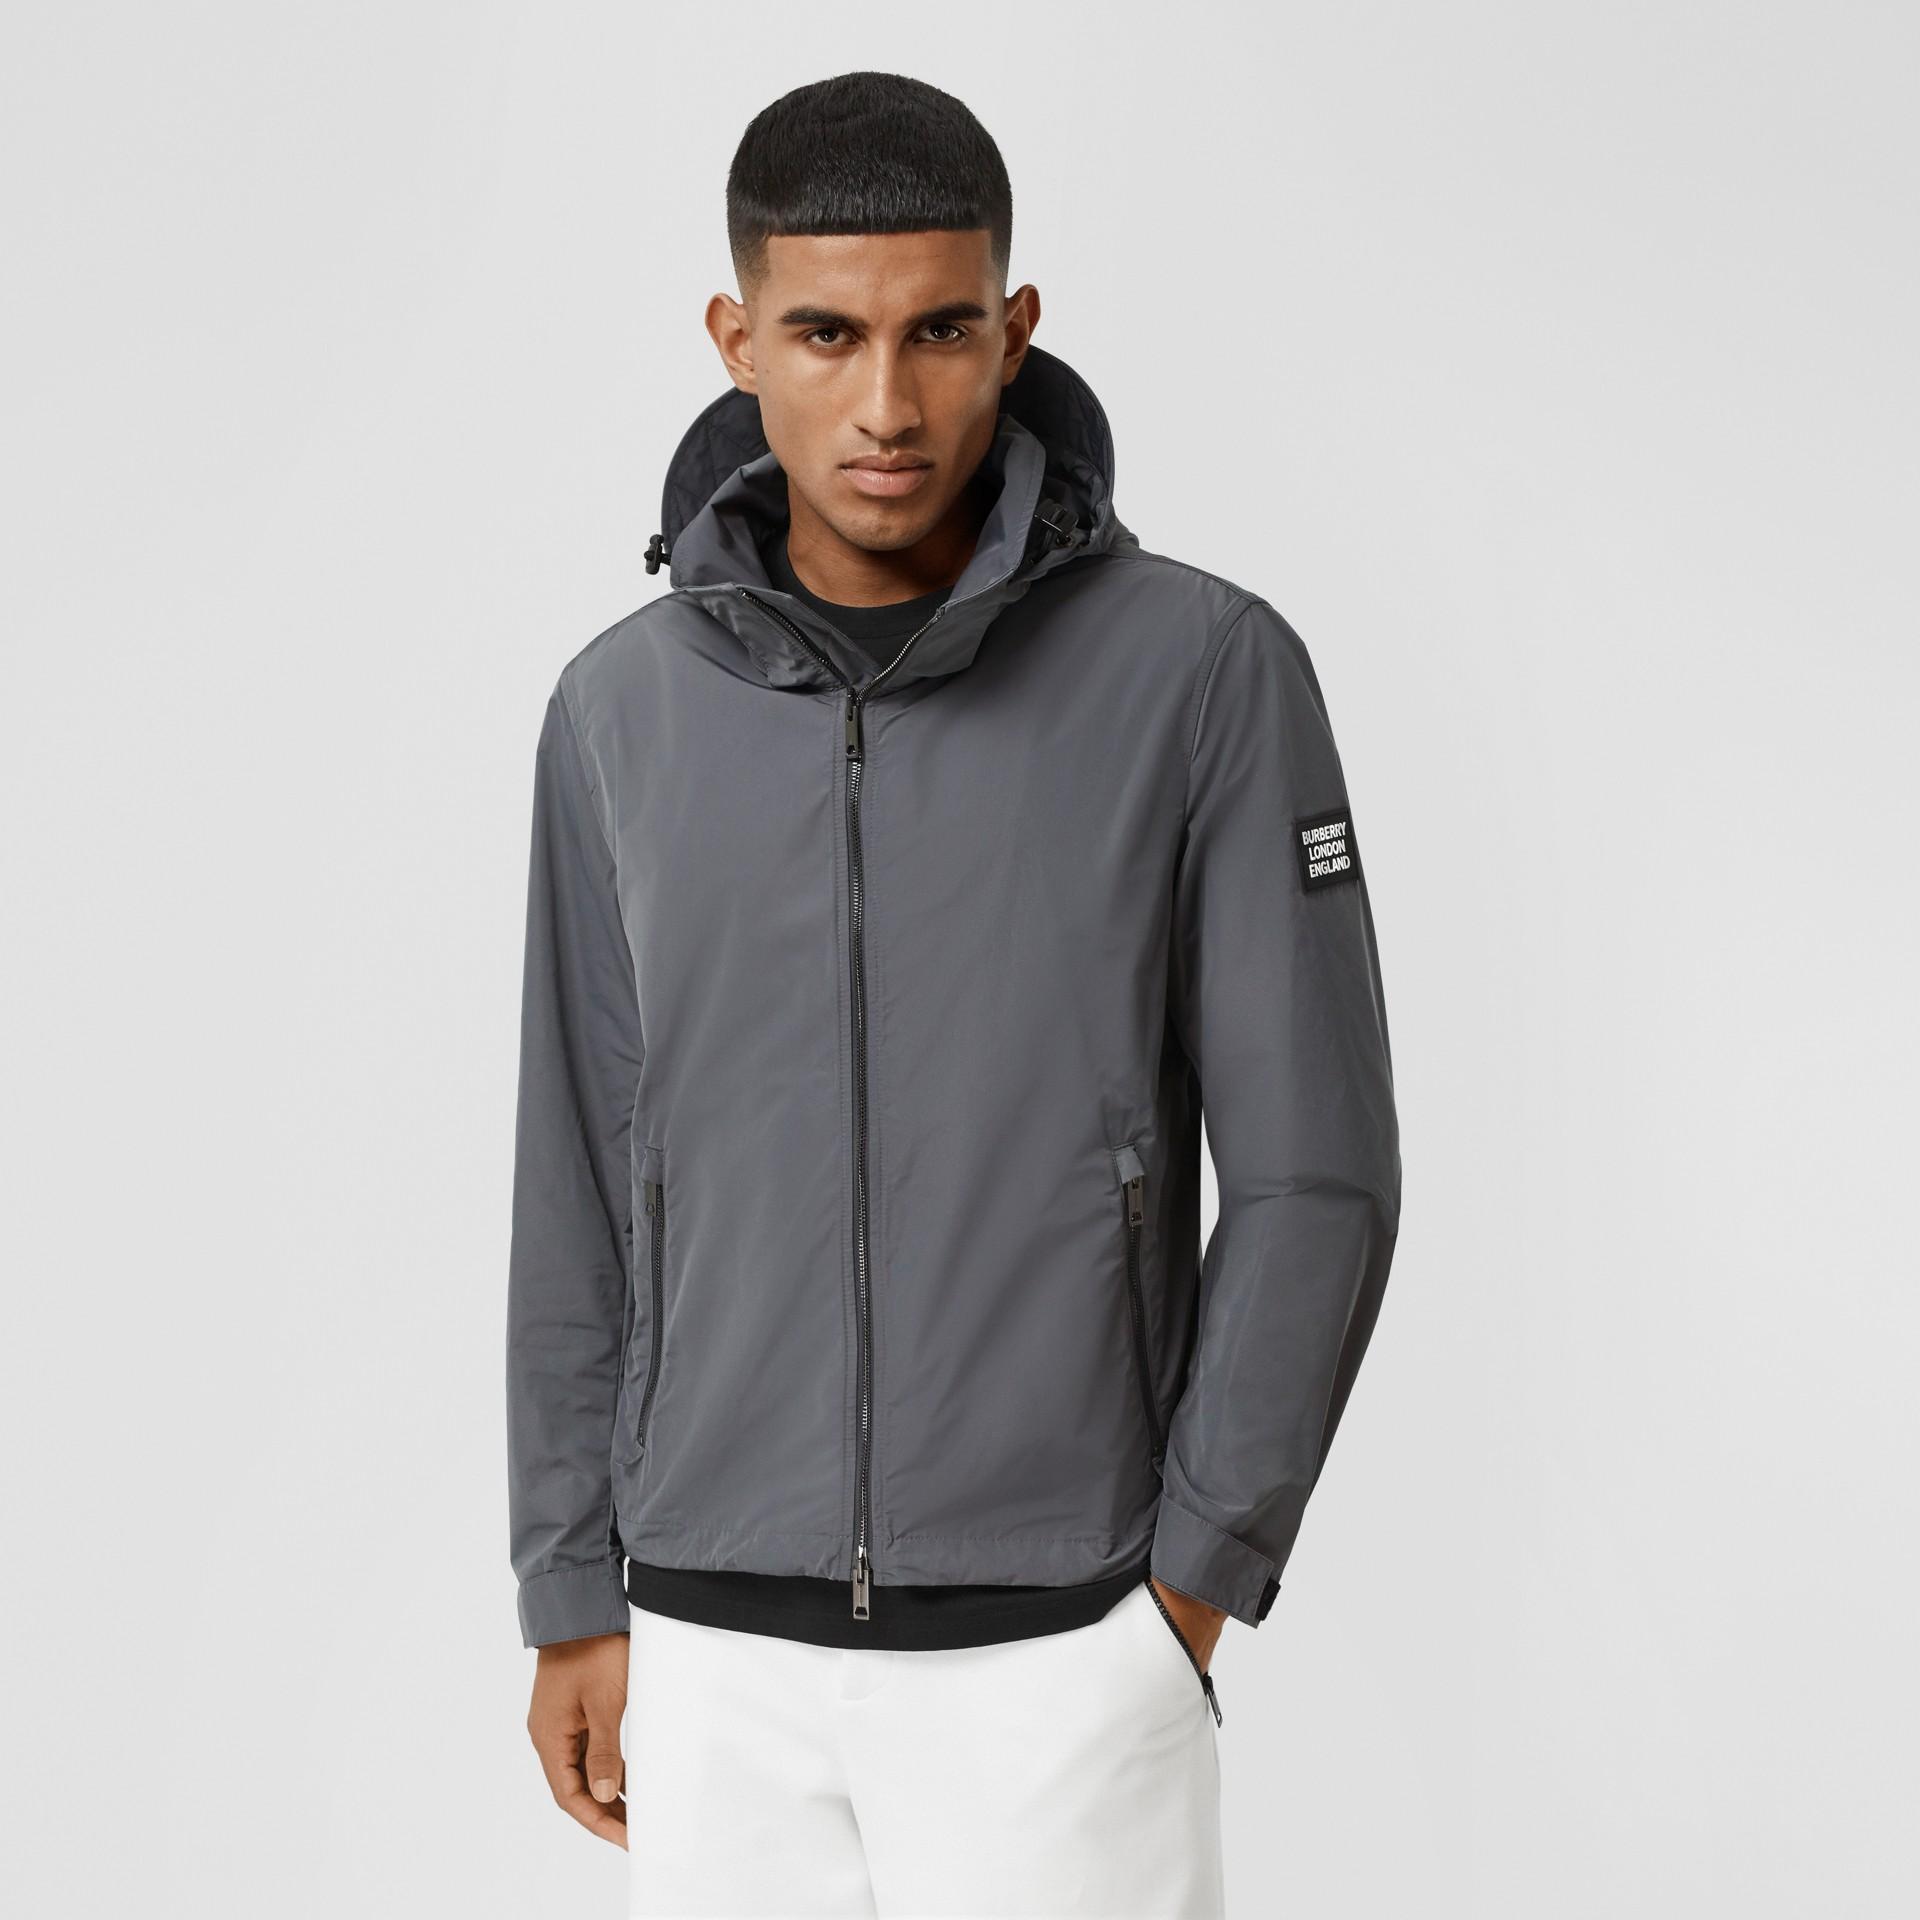 Packaway Hood Shape-memory Taffeta Jacket in Steel Grey - Men | Burberry Australia - gallery image 6